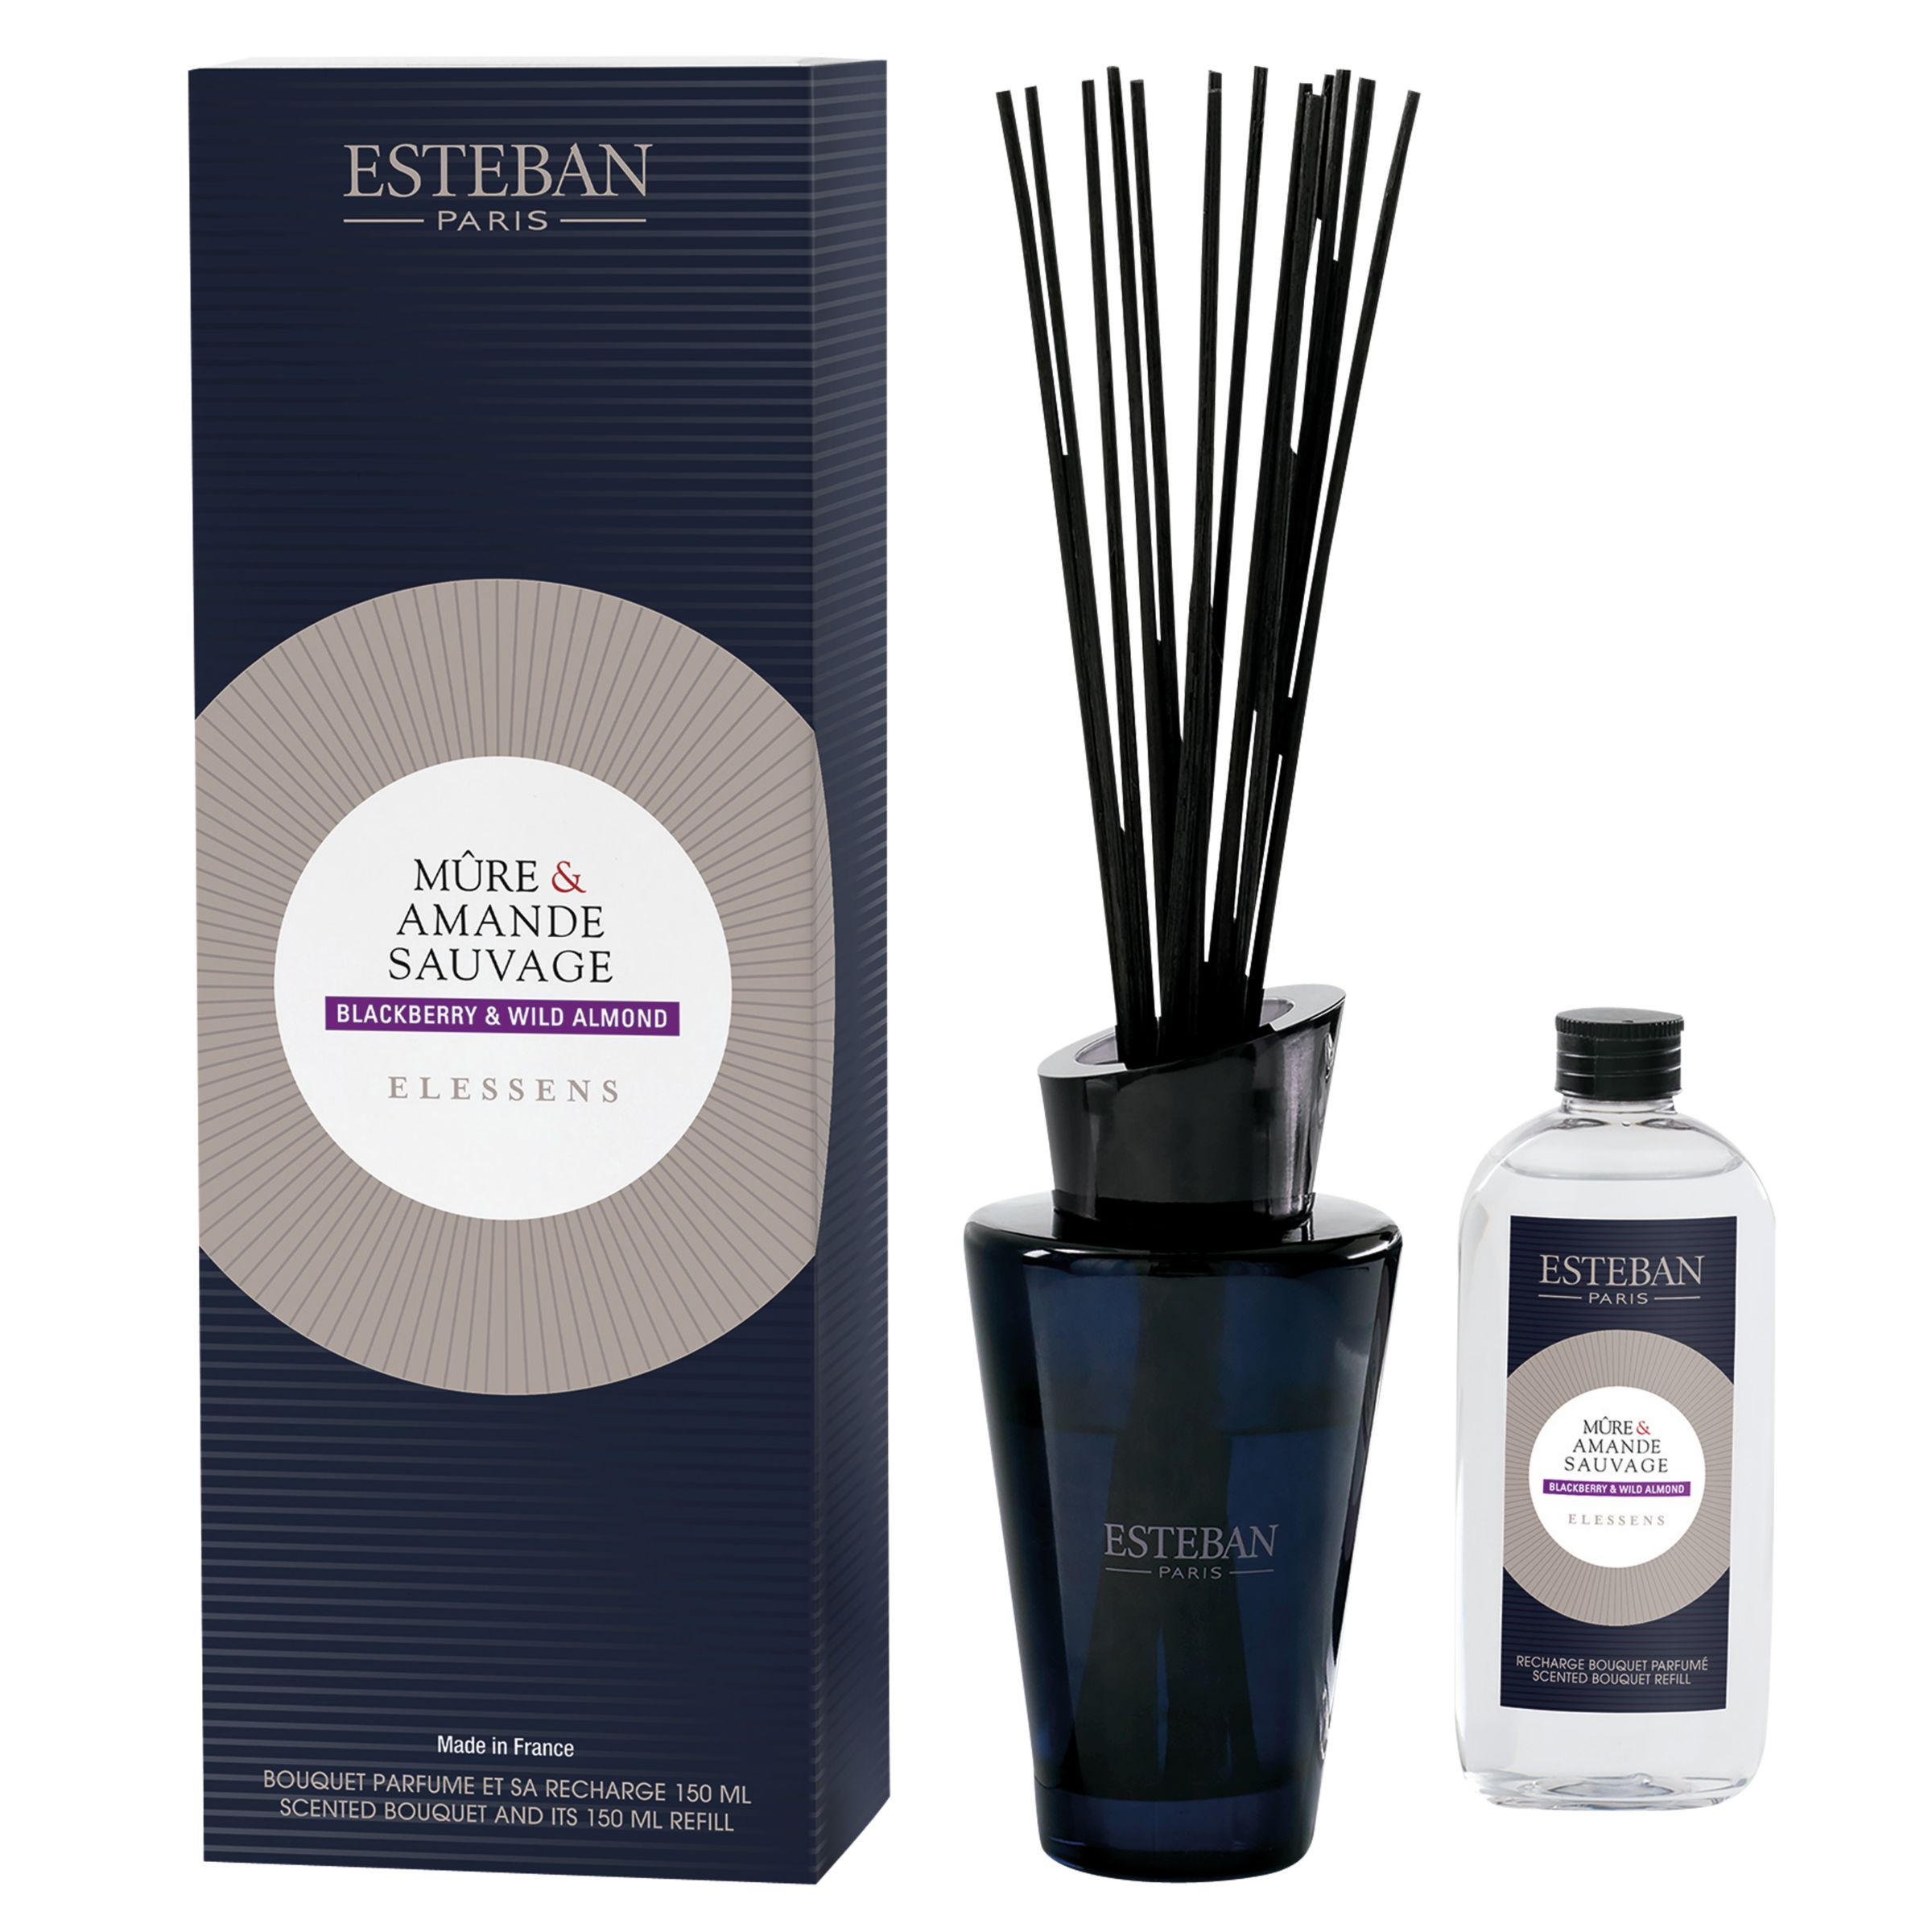 Esteban Esteban Blackberry & Wild Almond Diffuser, 150ml